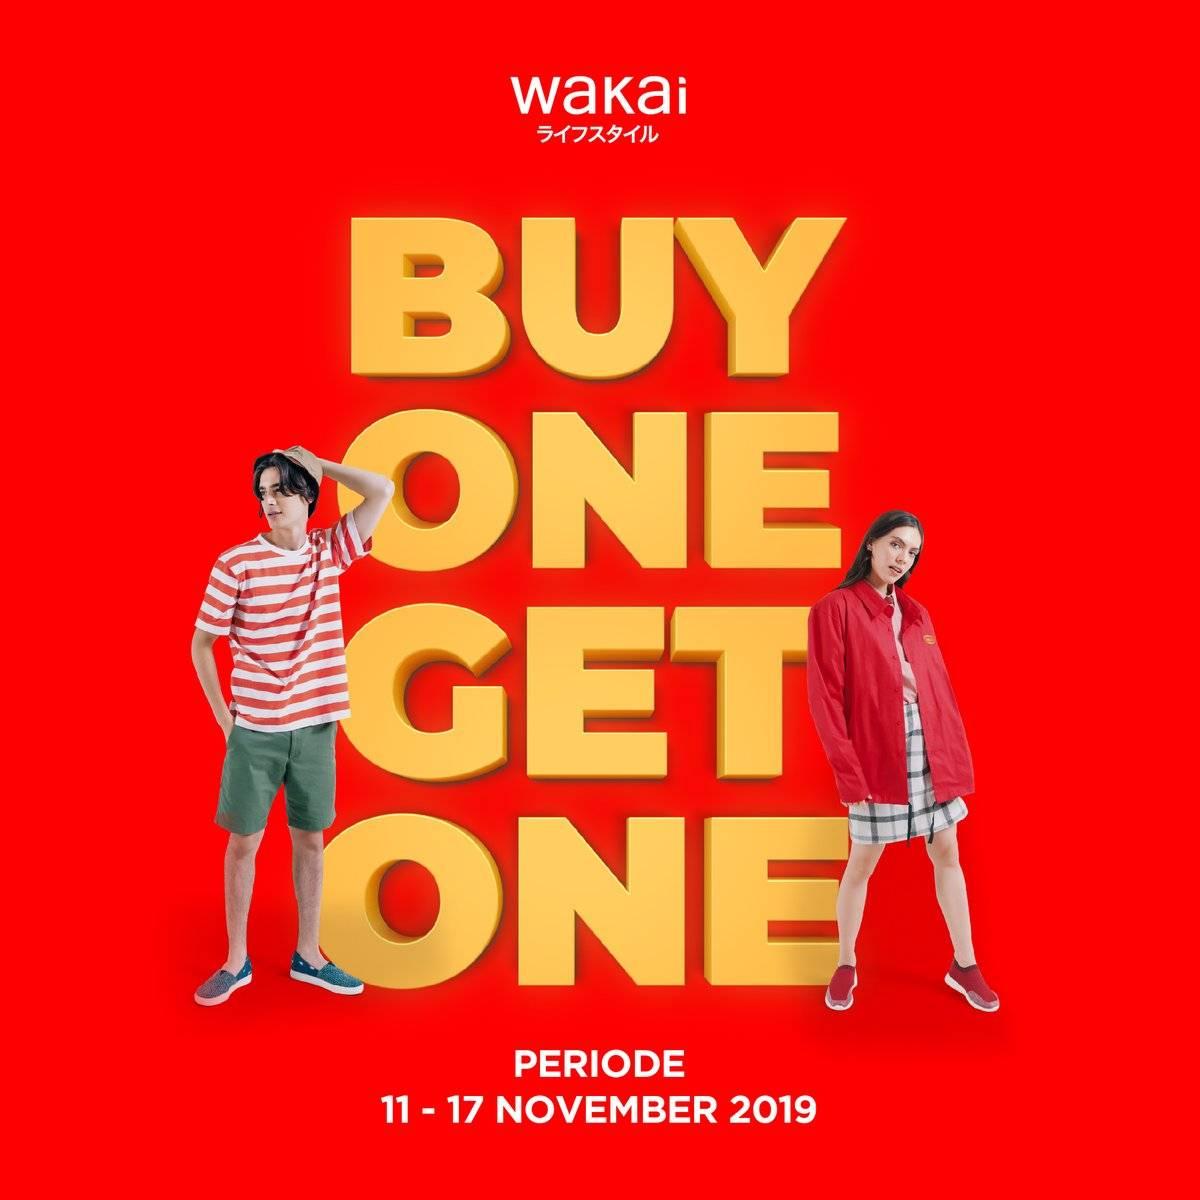 Wakai Promo Beli 1 Gratis 1 + Diskon 5%